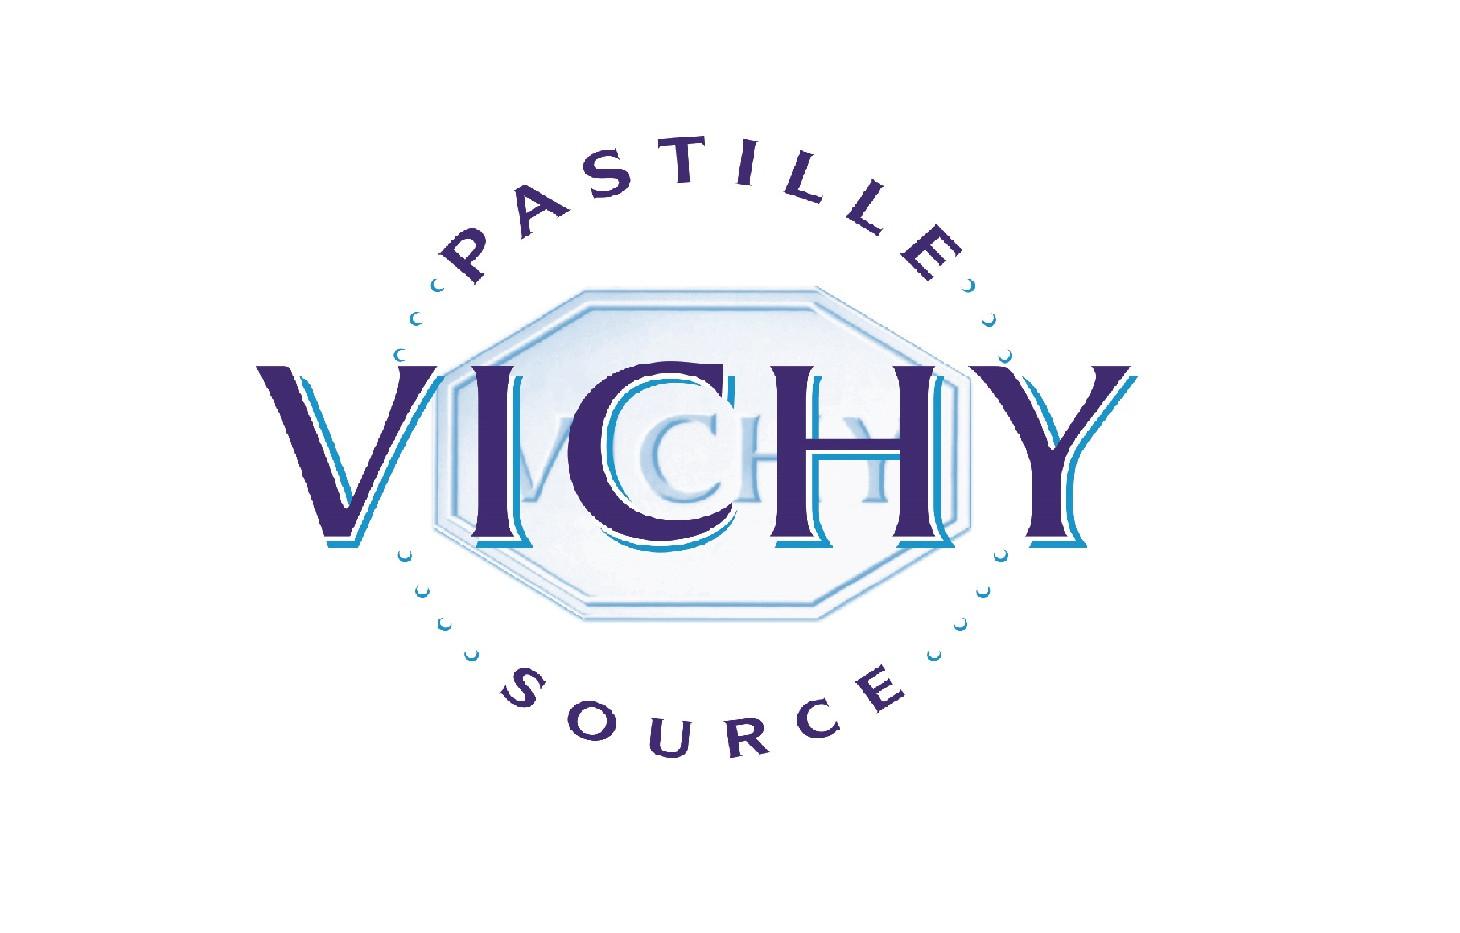 Pastille Vichy Source